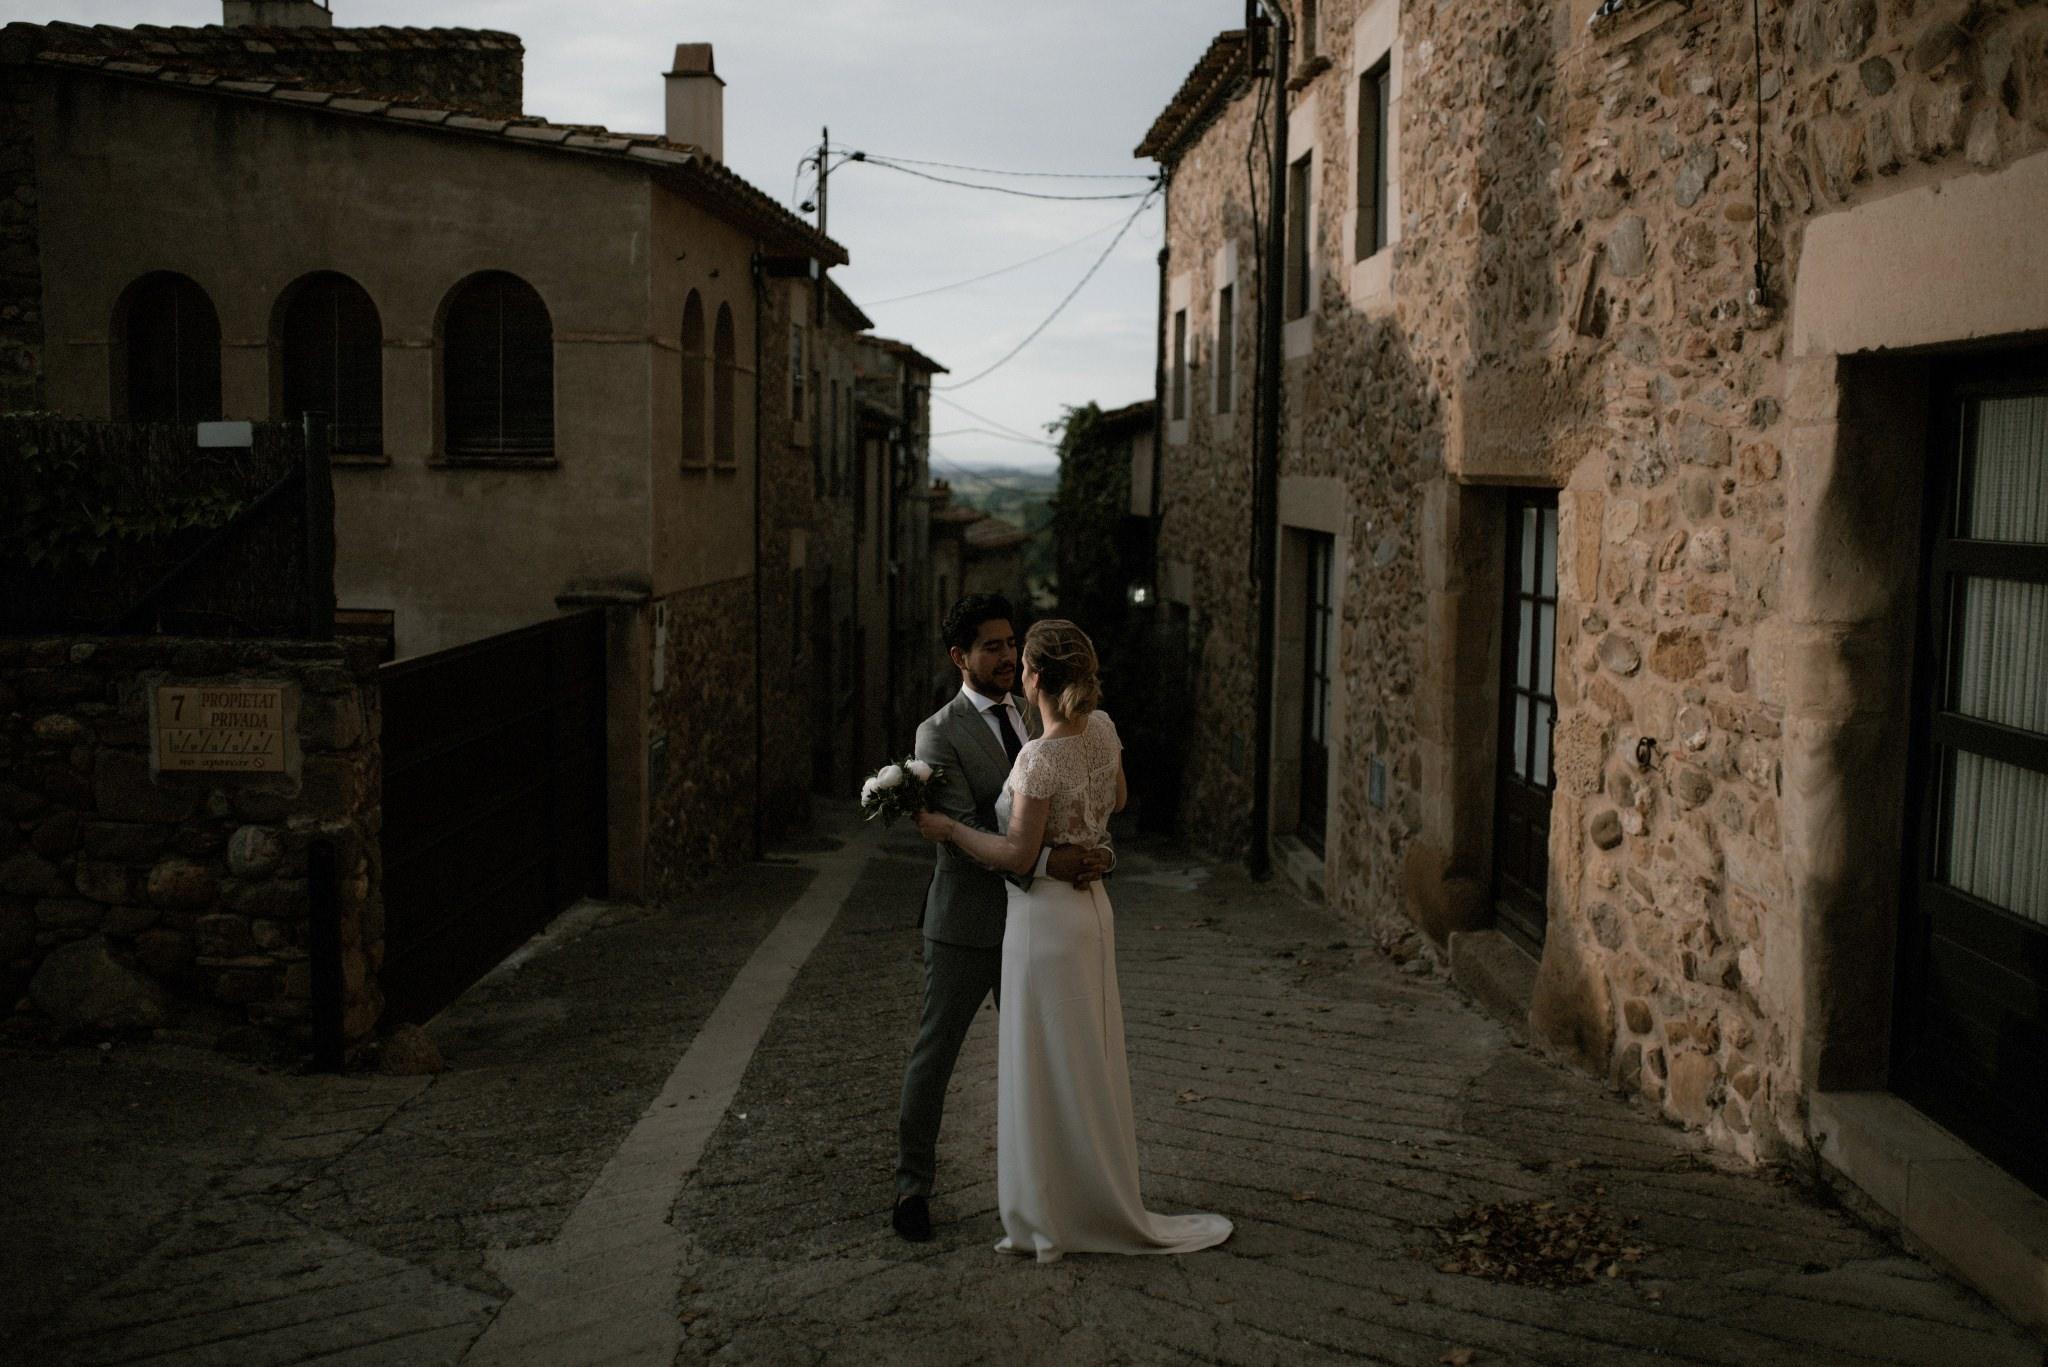 Bruidsfotograaf Spanje Castle d'Emporda destination wedding Naomi van der Kraan00054.jpg